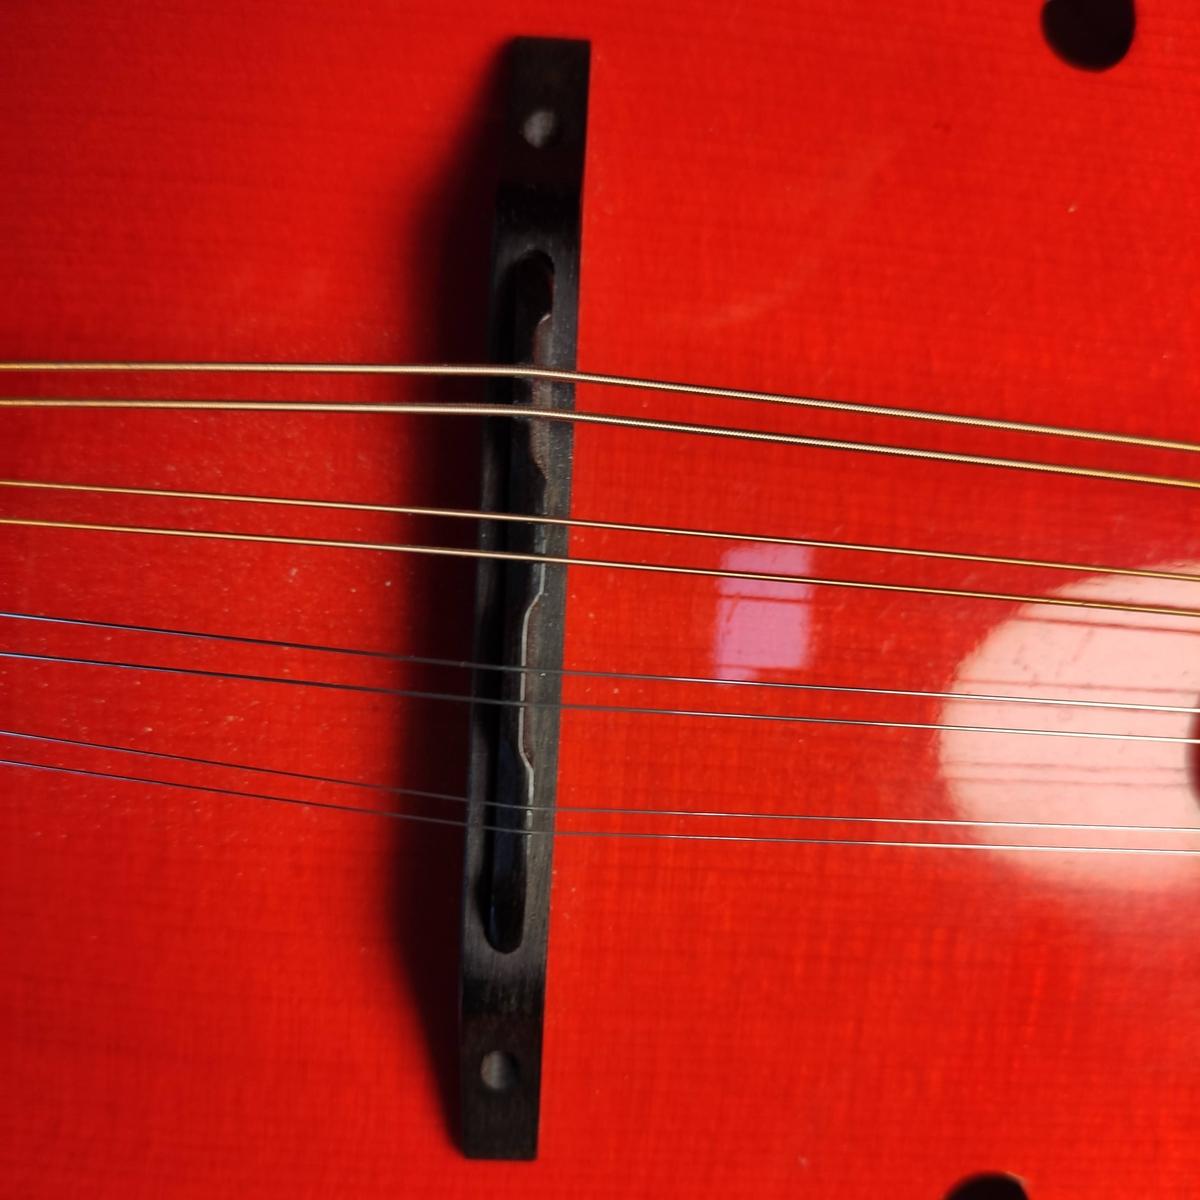 Mandoline Steg Coufleau Brekke Gibson A9 Bluegrass Kompensation